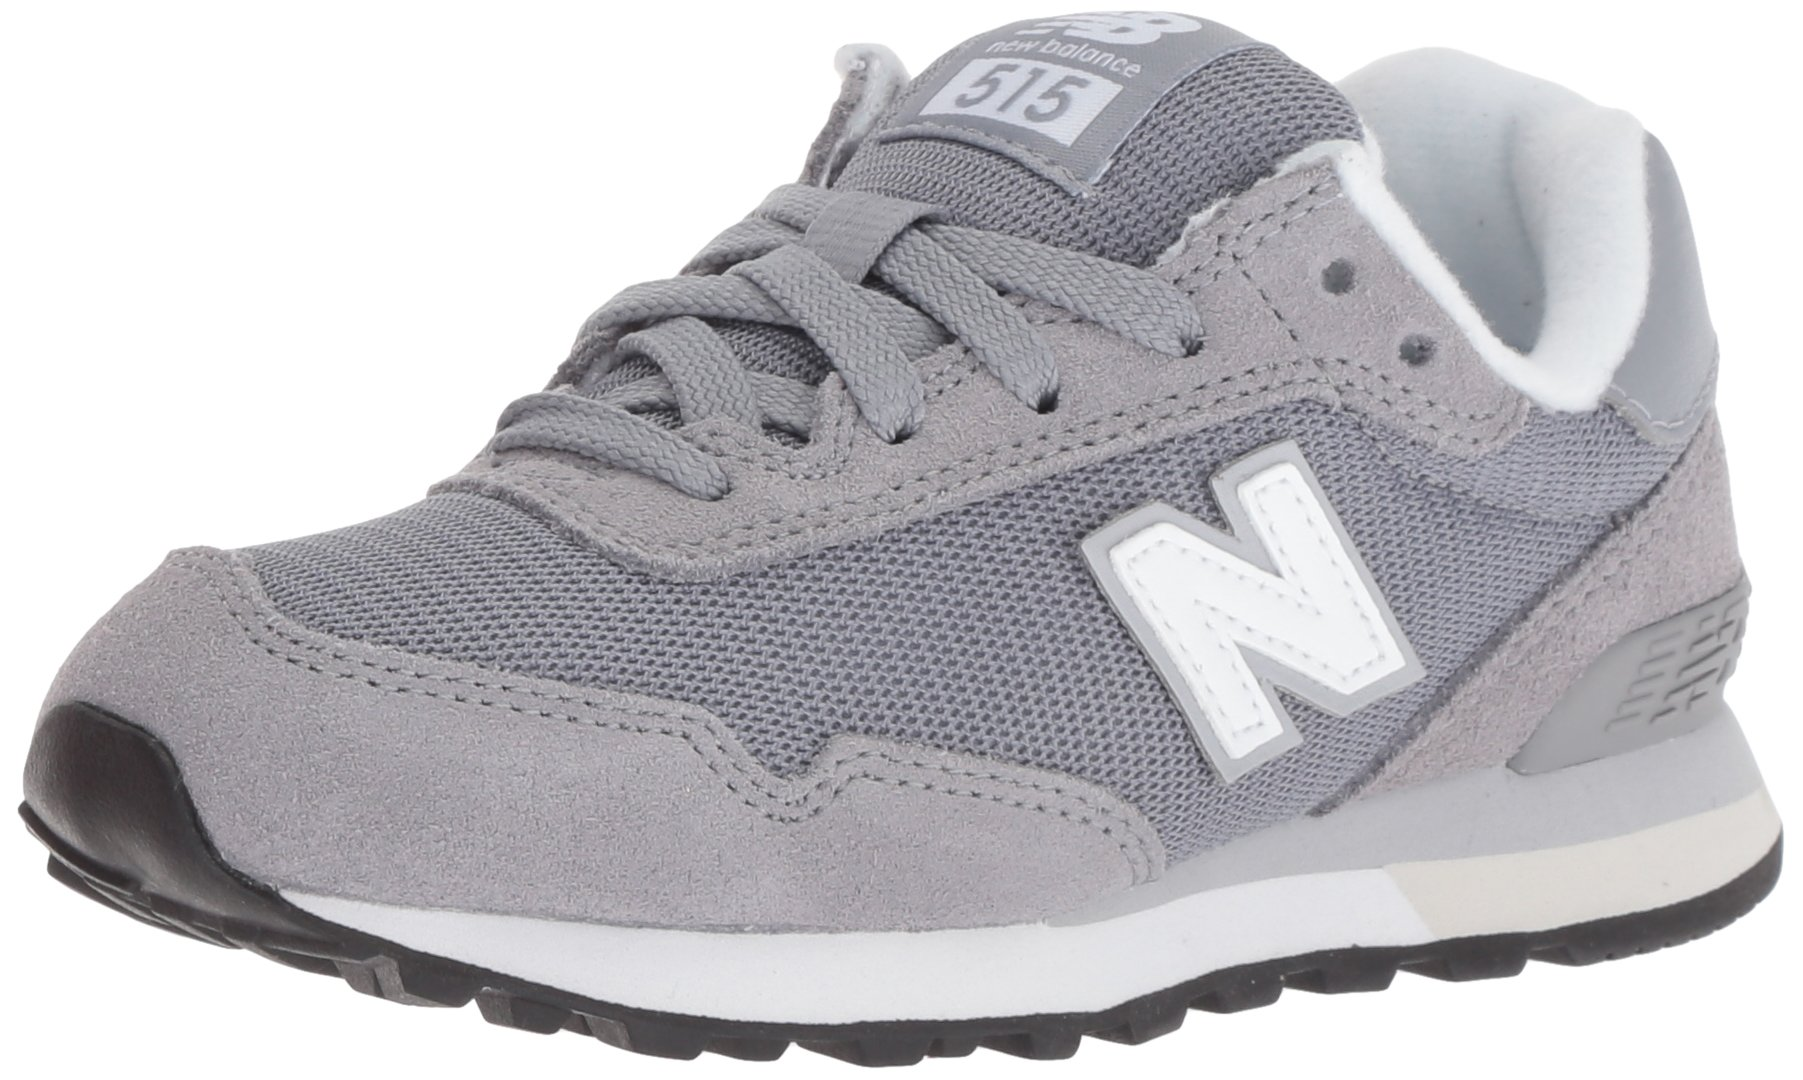 New Balance Boys' 515v1 Sneaker, grey/white, 5 M US Big Kid